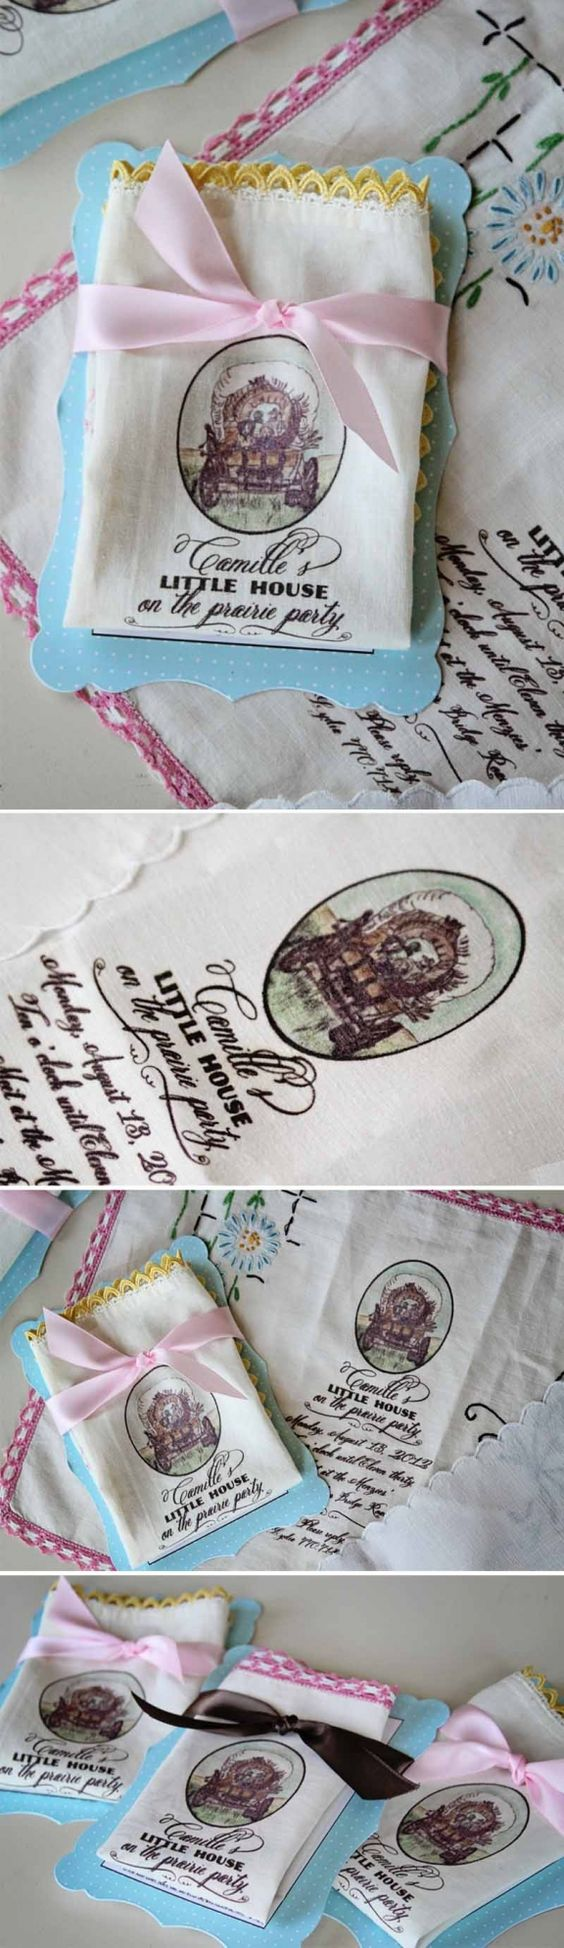 Loralee Lewis Handkerchief Little House on the  Prairie Invitation: Birthdays Party, Invitations Party, Little House, Party Themes, Handkerchief Invitations, Lewis Handkerchief, House Party, Party Ideas